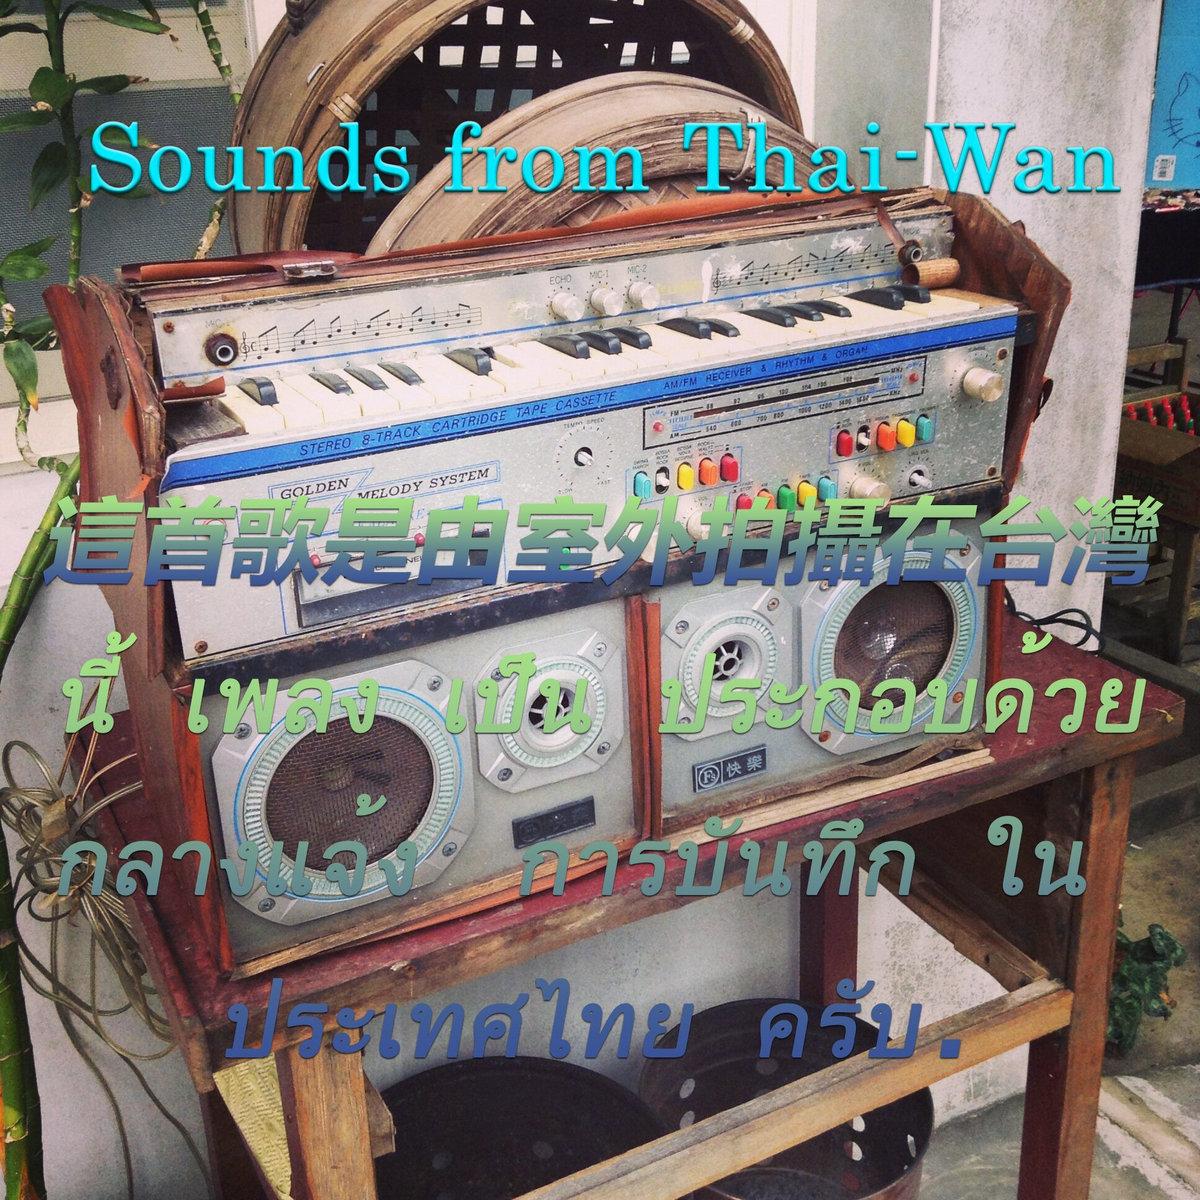 Sounds from Thai-Wan ~這首歌是由室外拍攝在台灣/นี้ เพลง เป็น ประกอบด้วย กลางแจ้ง การบันทึก ใน ประเทศไทย ครับ | 鰻屋